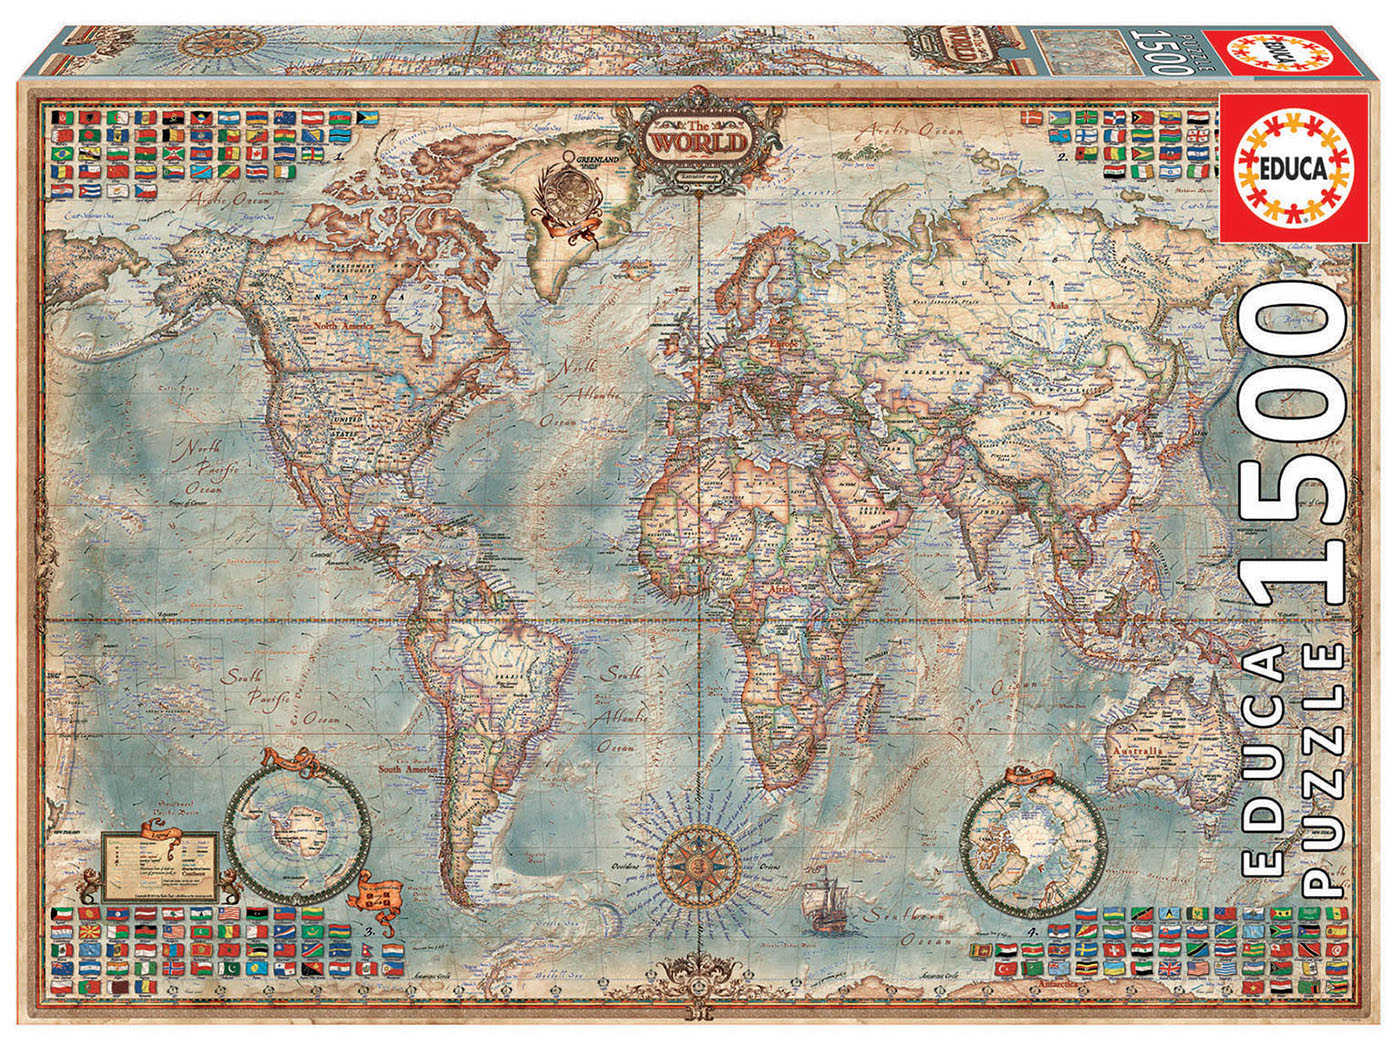 1500 Le monde, carte politique